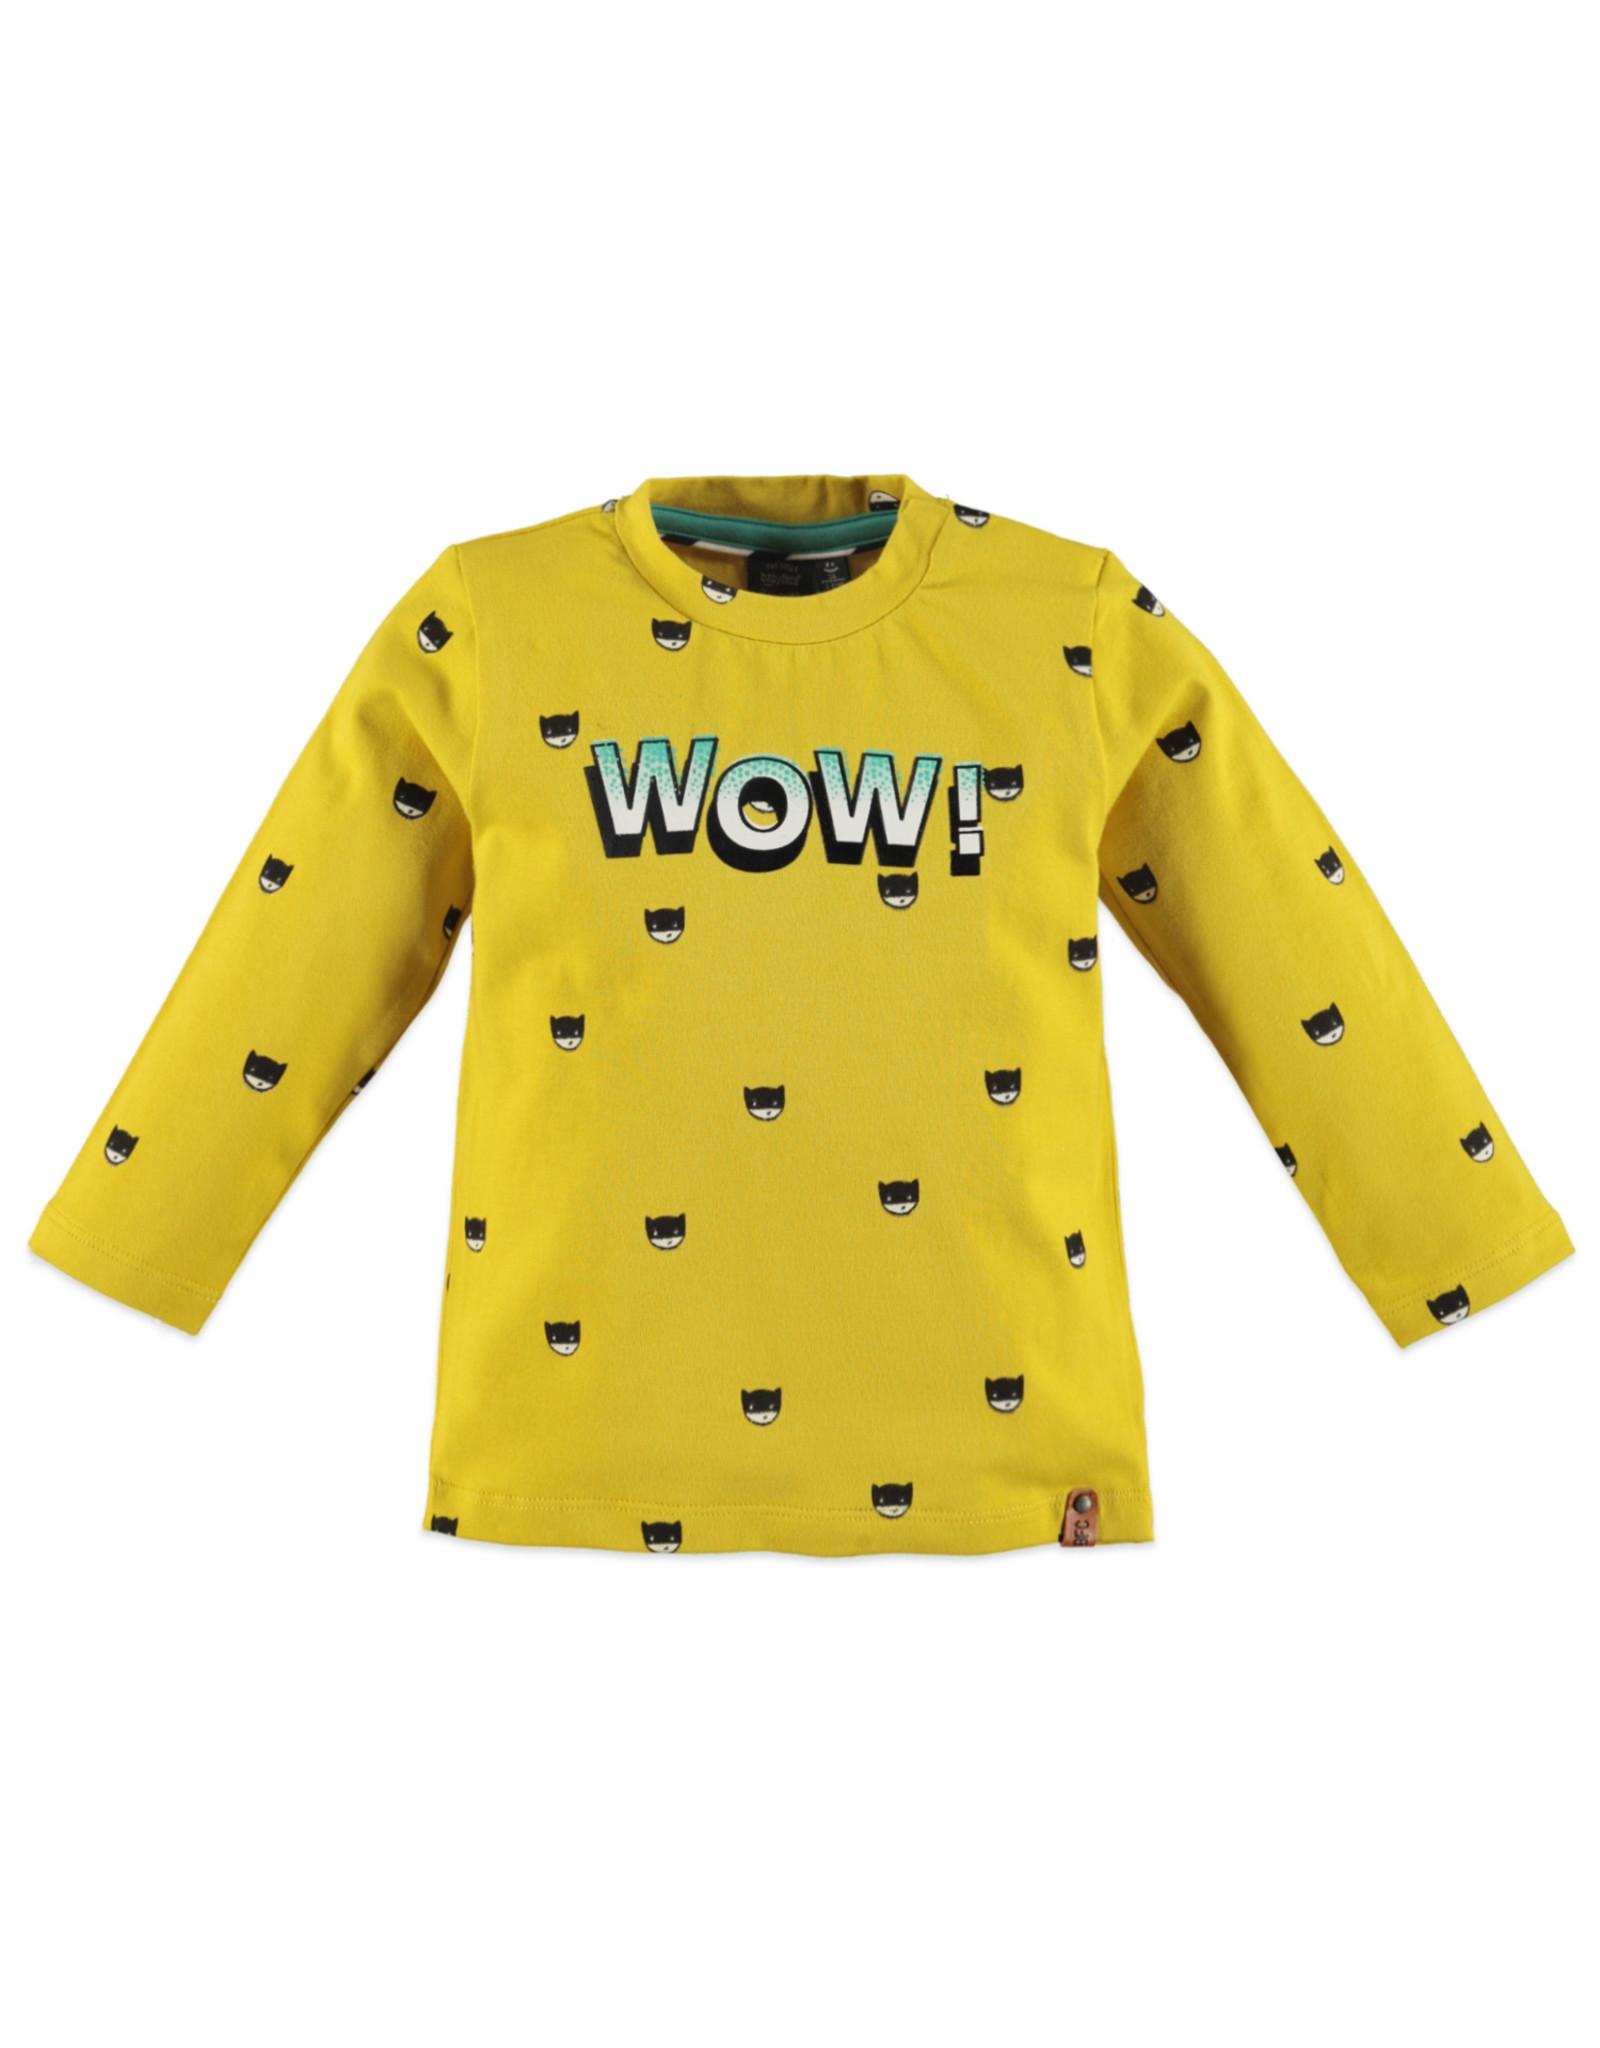 Babyface boys t-shirt long sleeve/corn